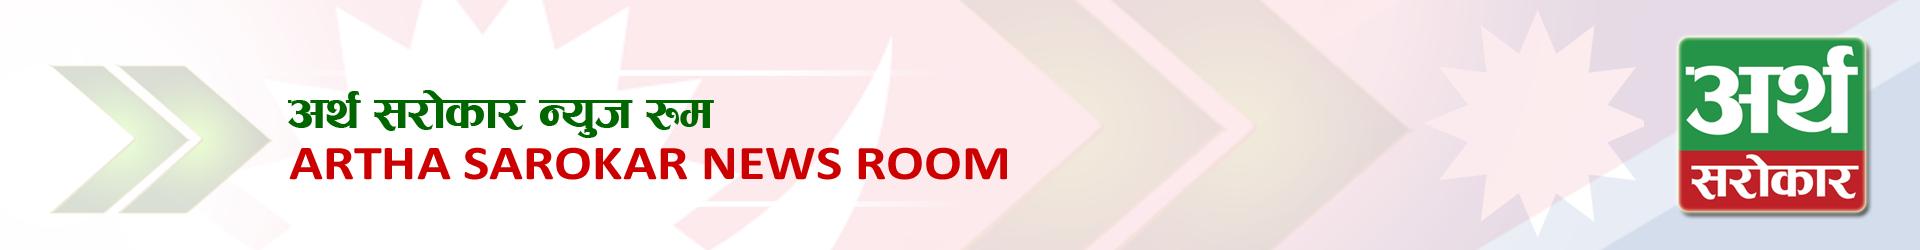 News Room :: Artha Sarokar